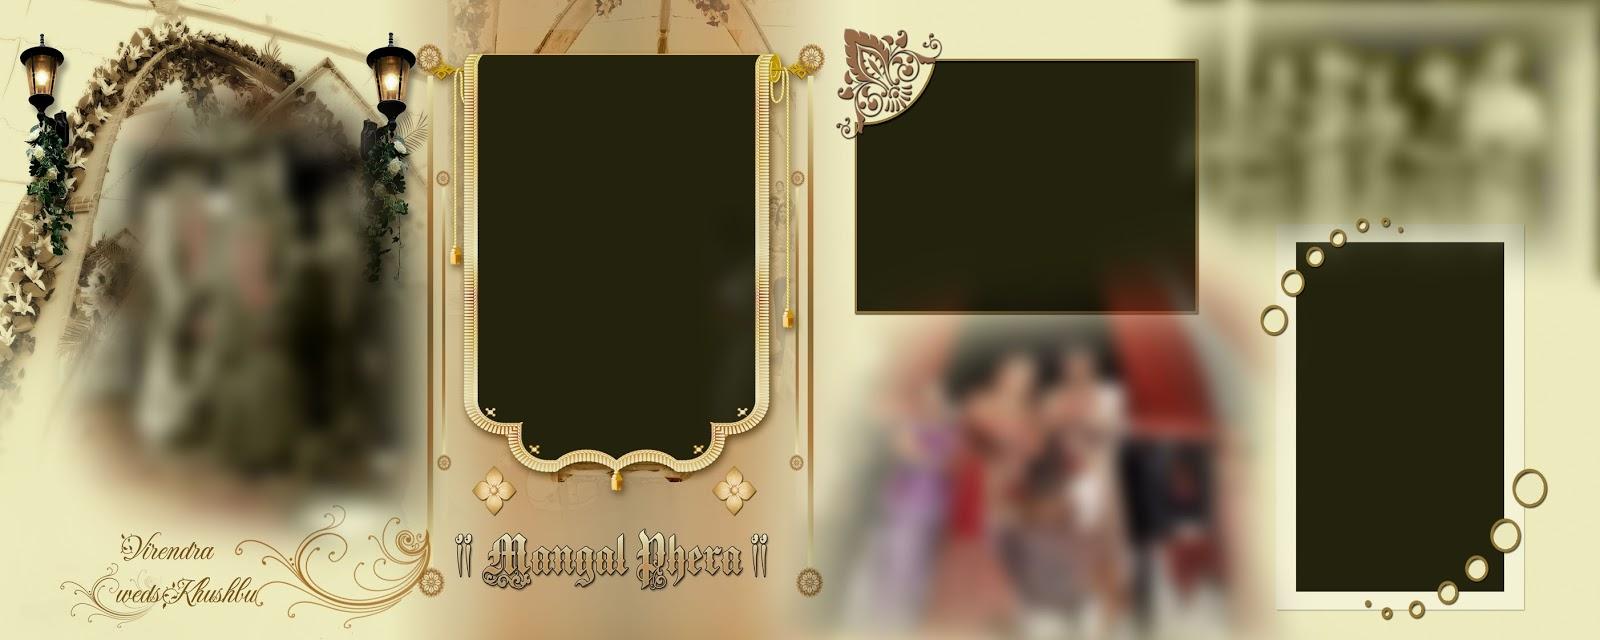 Pictures Of Wedding Album Design Psd Free Download 12x36 Kidskunst